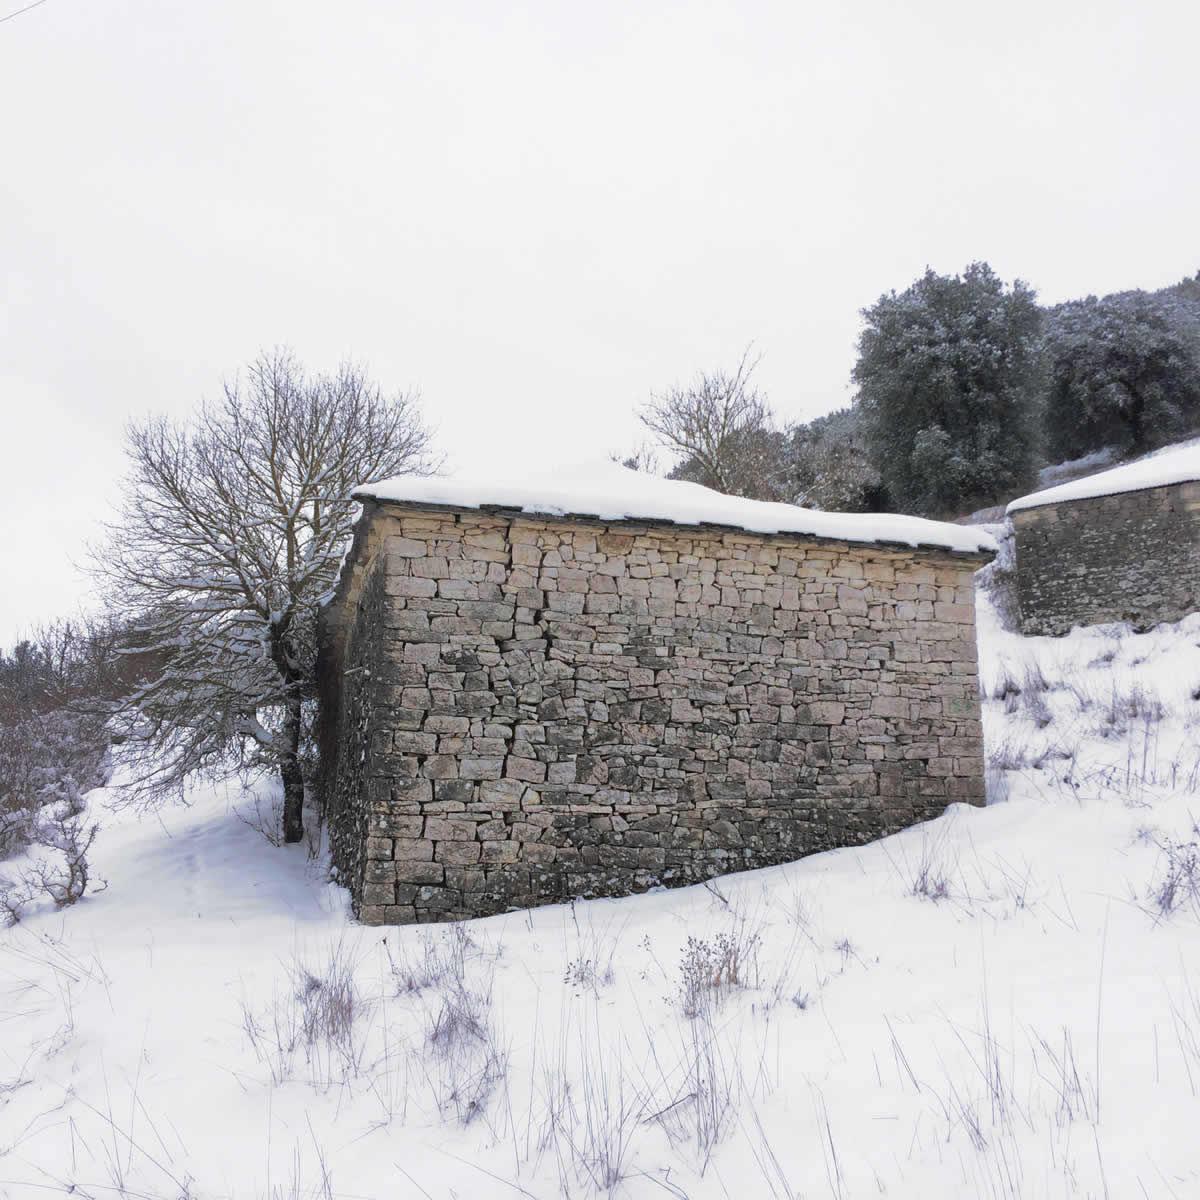 An old snow-covered stone building, Kato Pedina village, Zagori